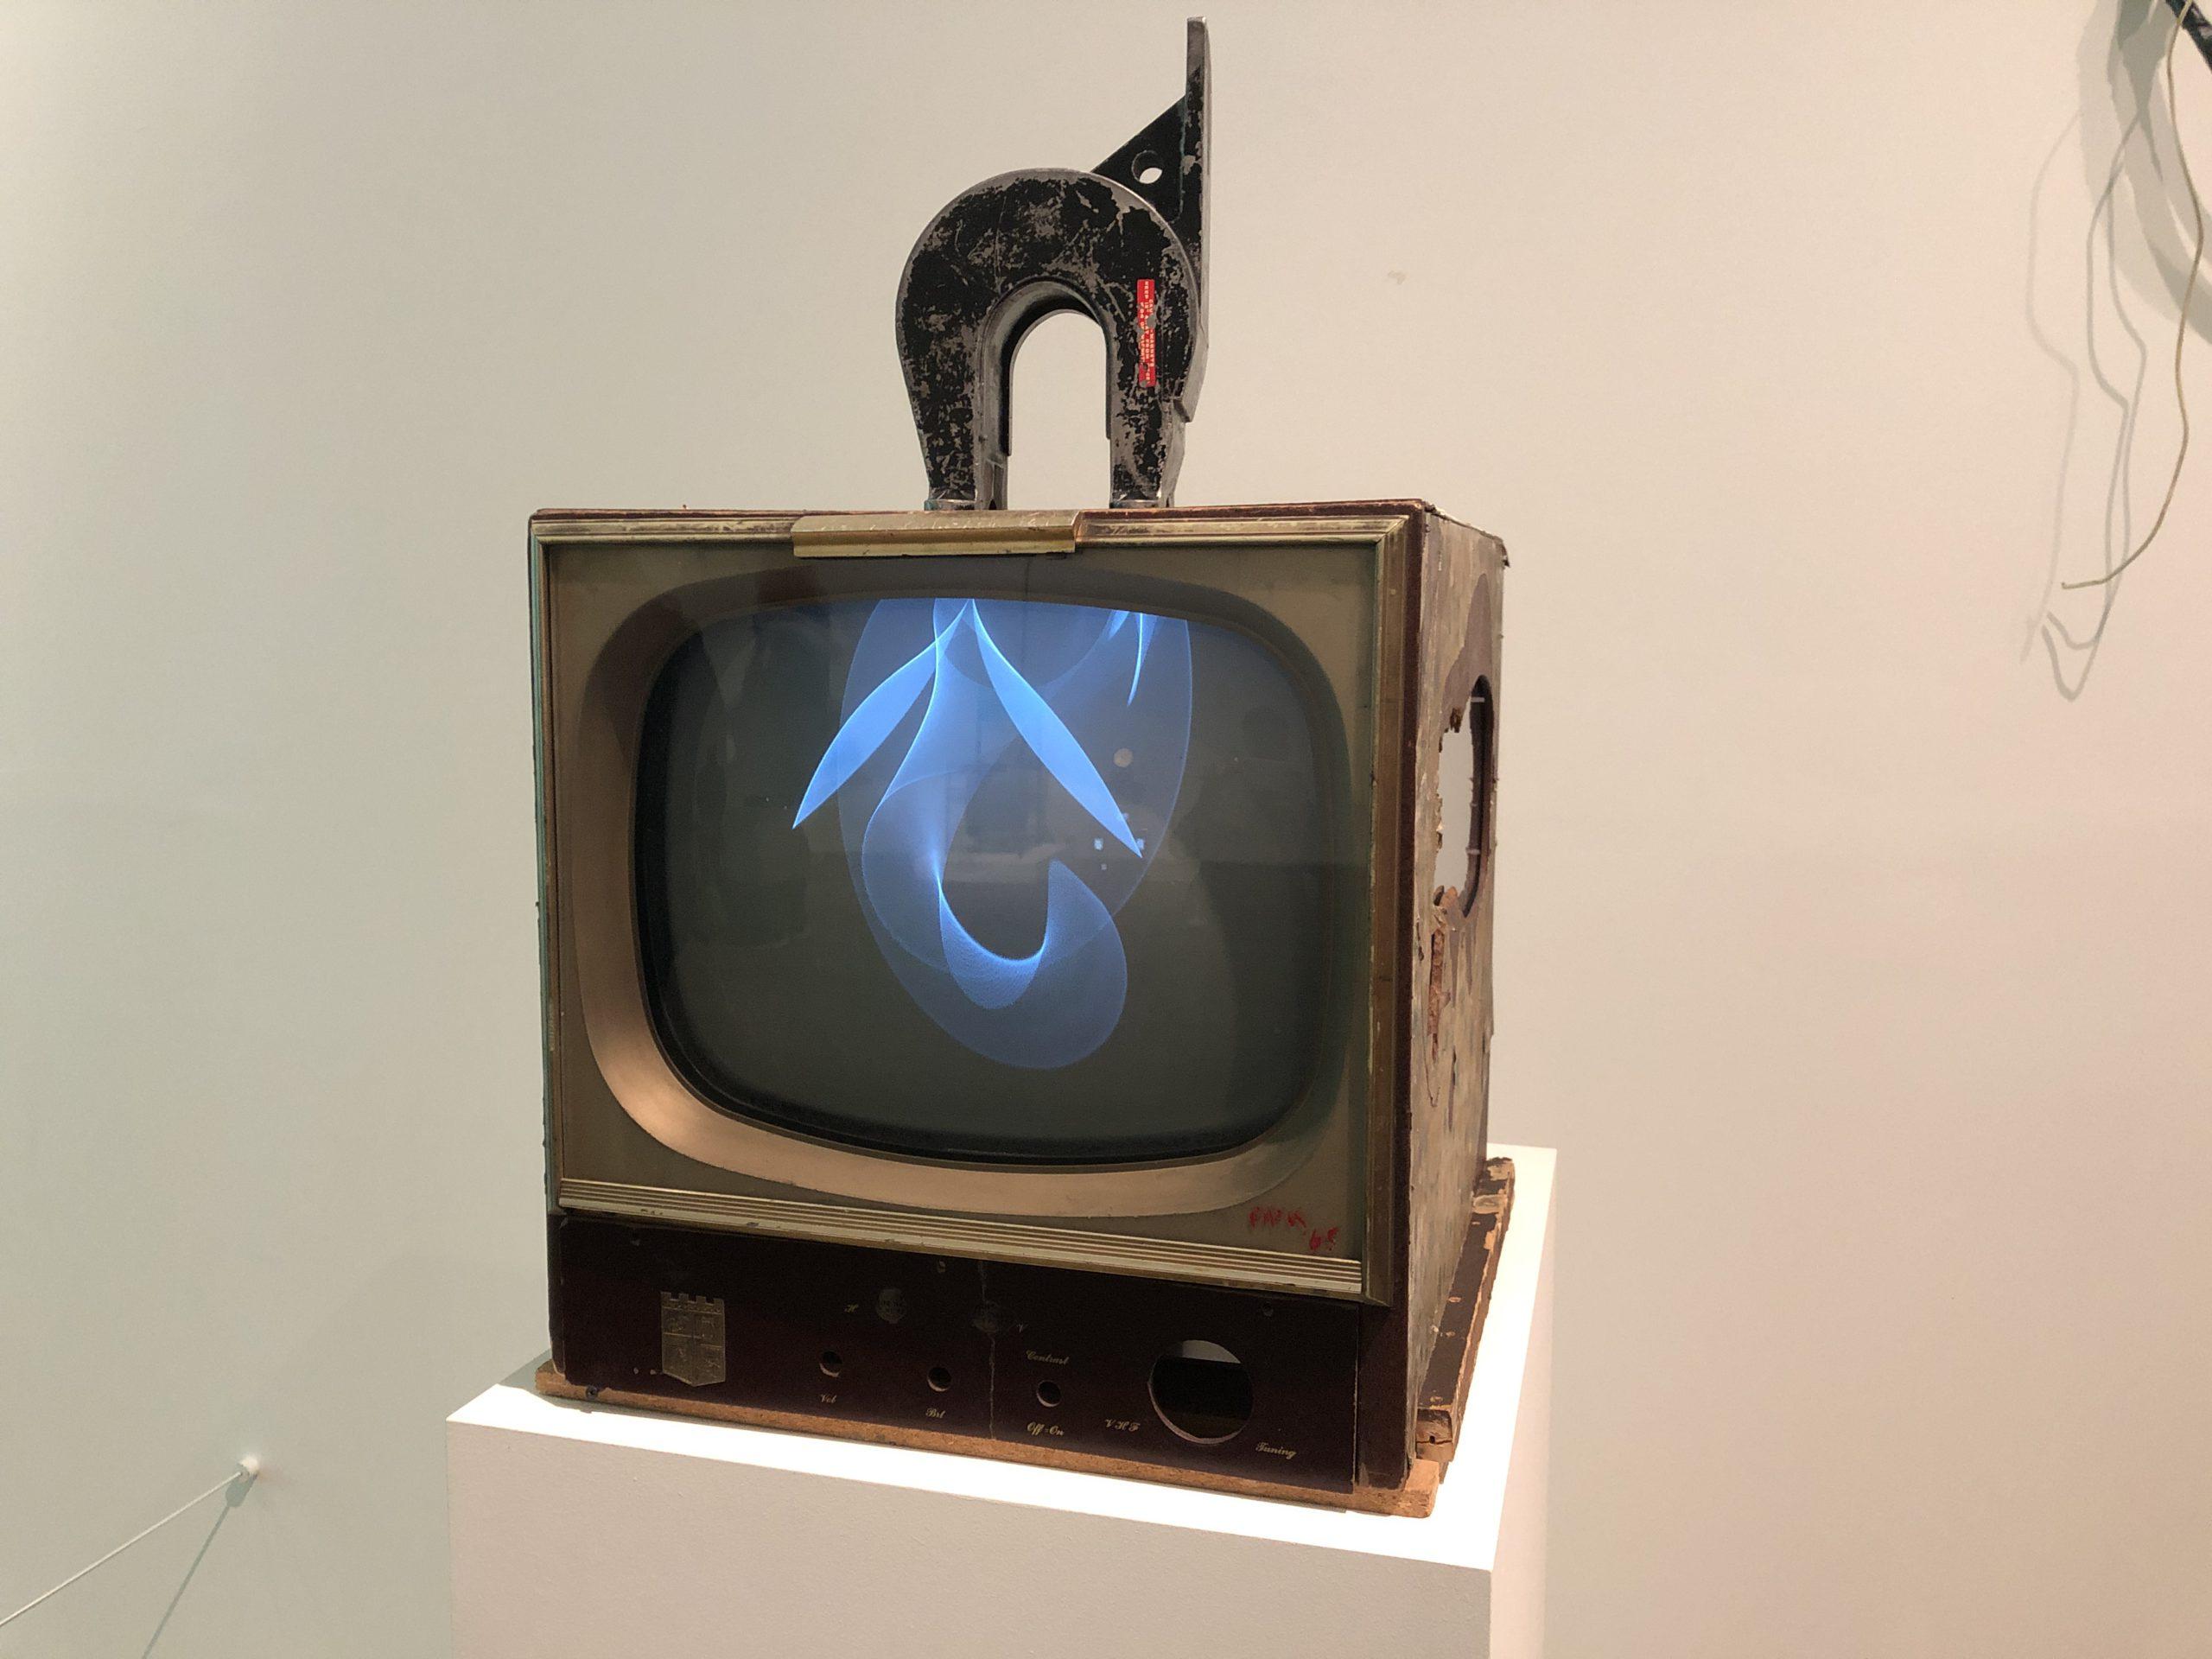 Image of artwork titled Magnet TV by artist Nam June Paik